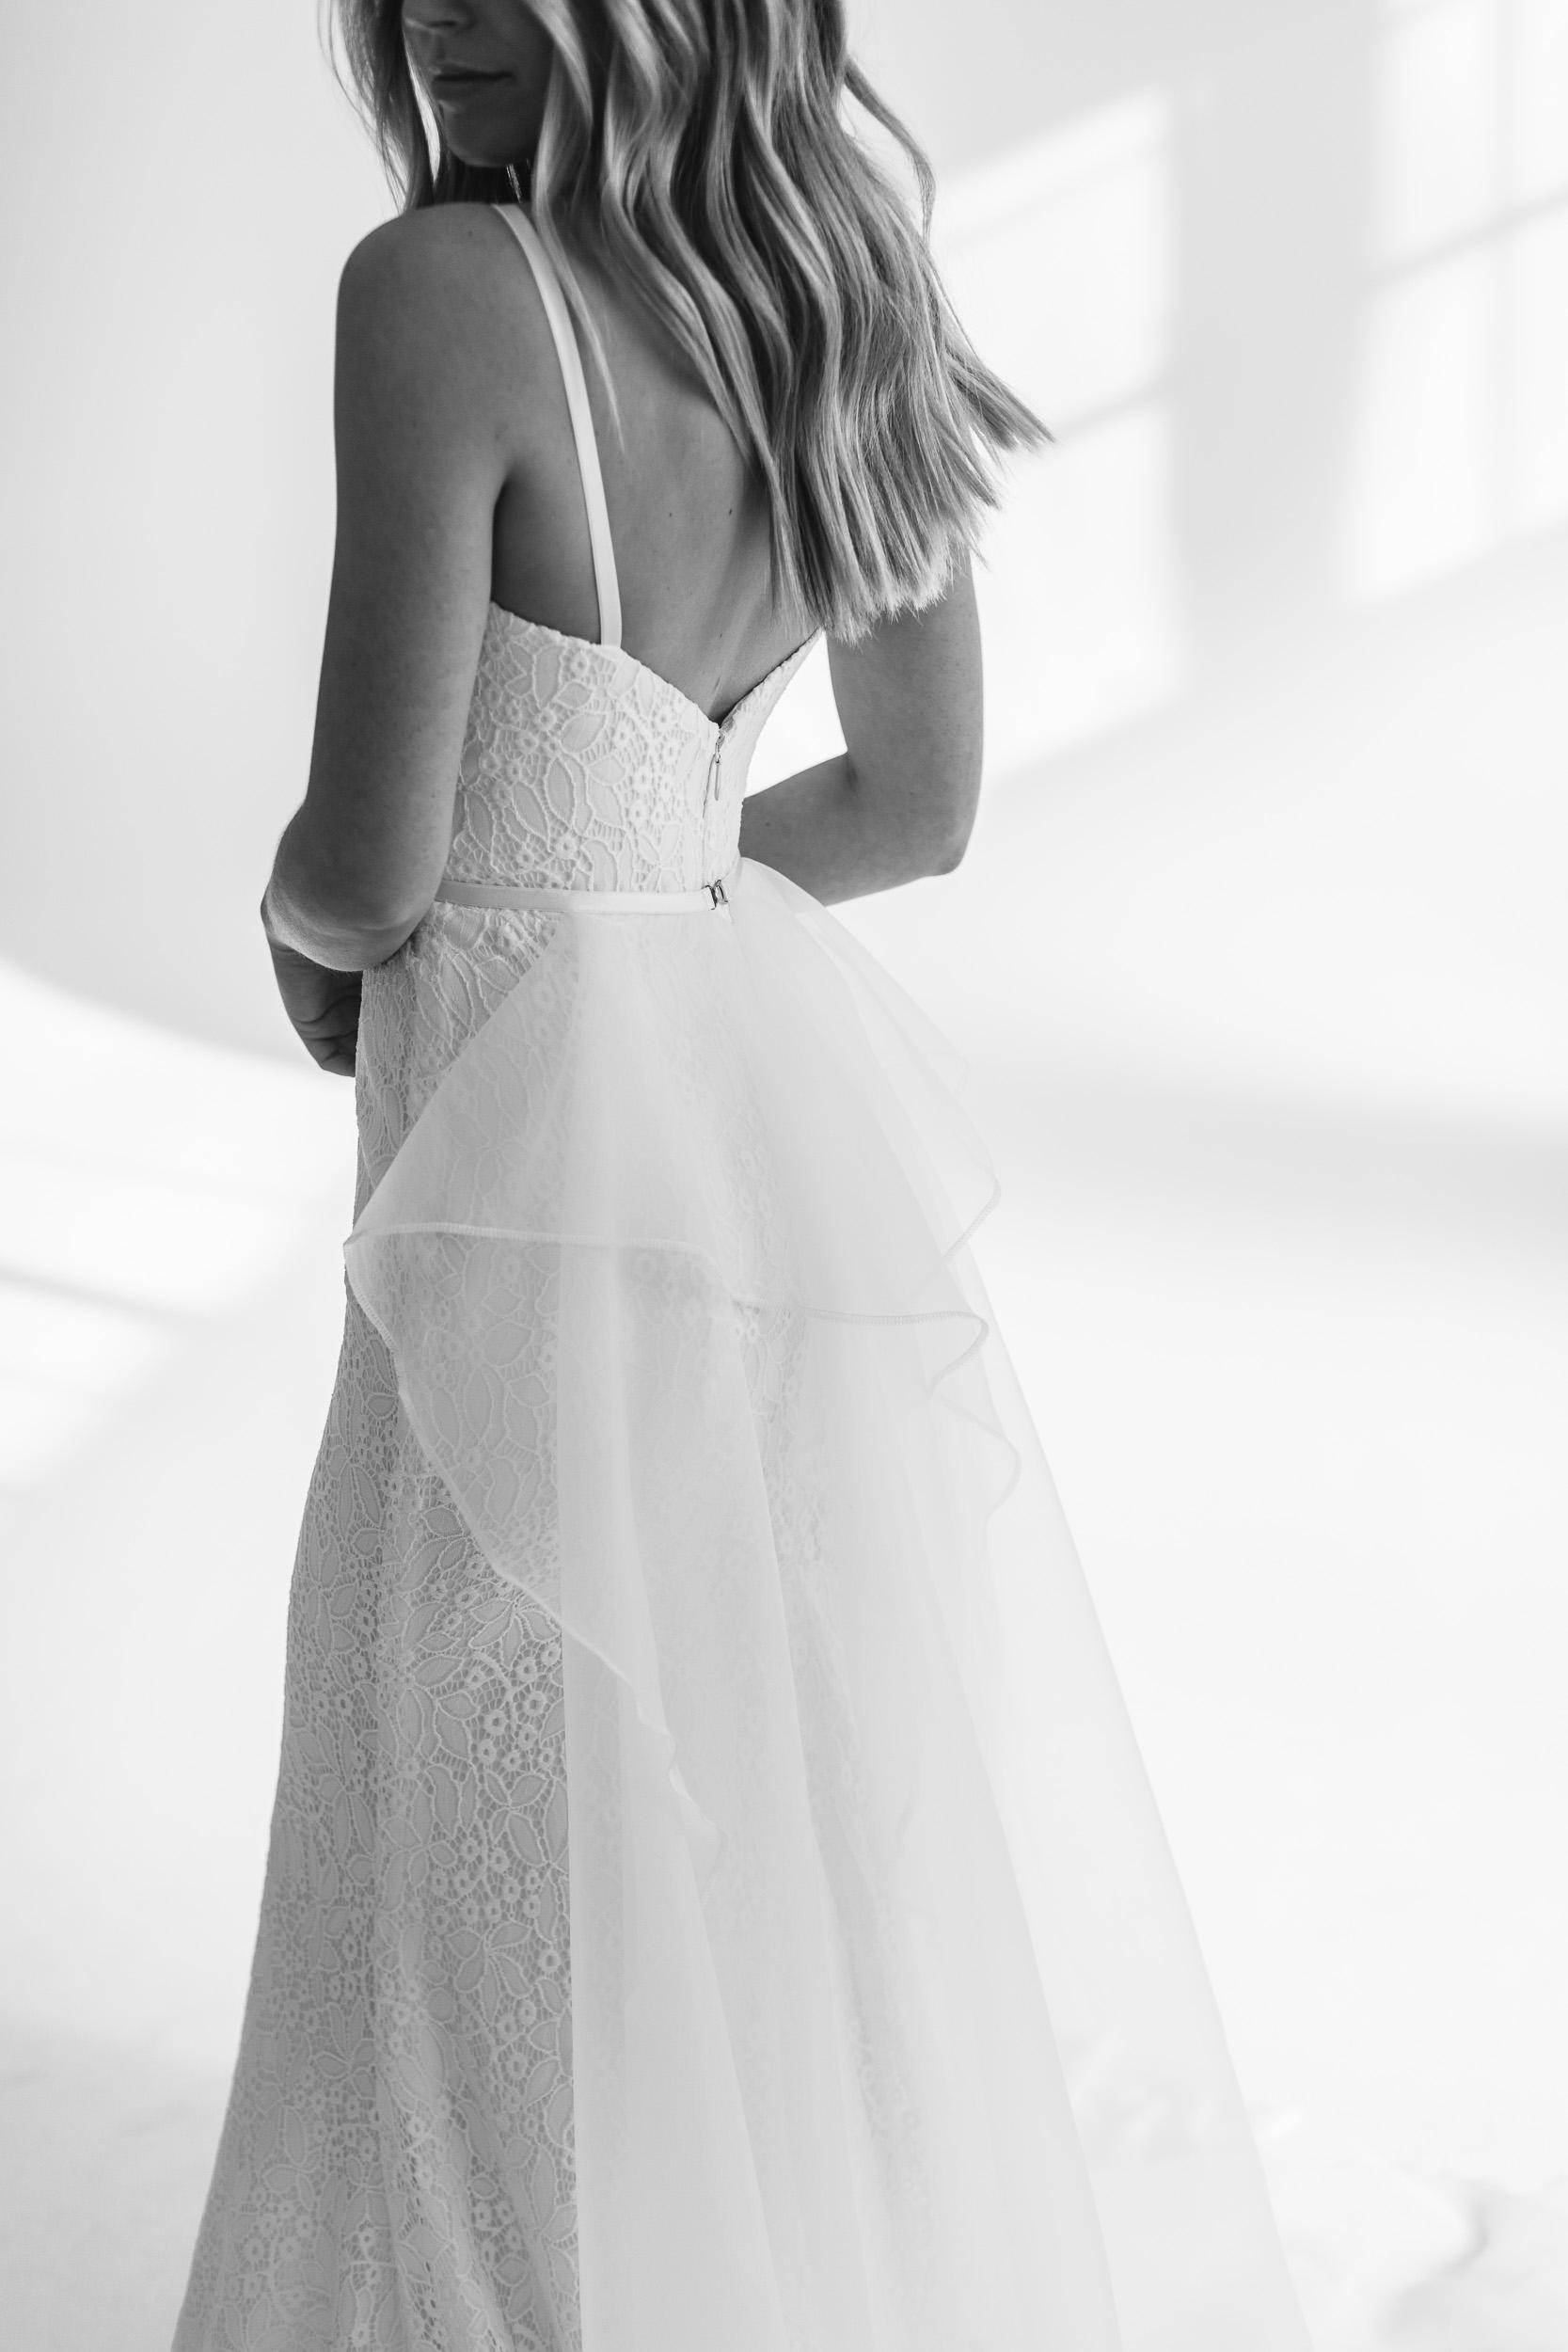 Kas-Richards-Karen-Willis_Holmes-Bridal-Wild-Hearts-Collection-186.jpg